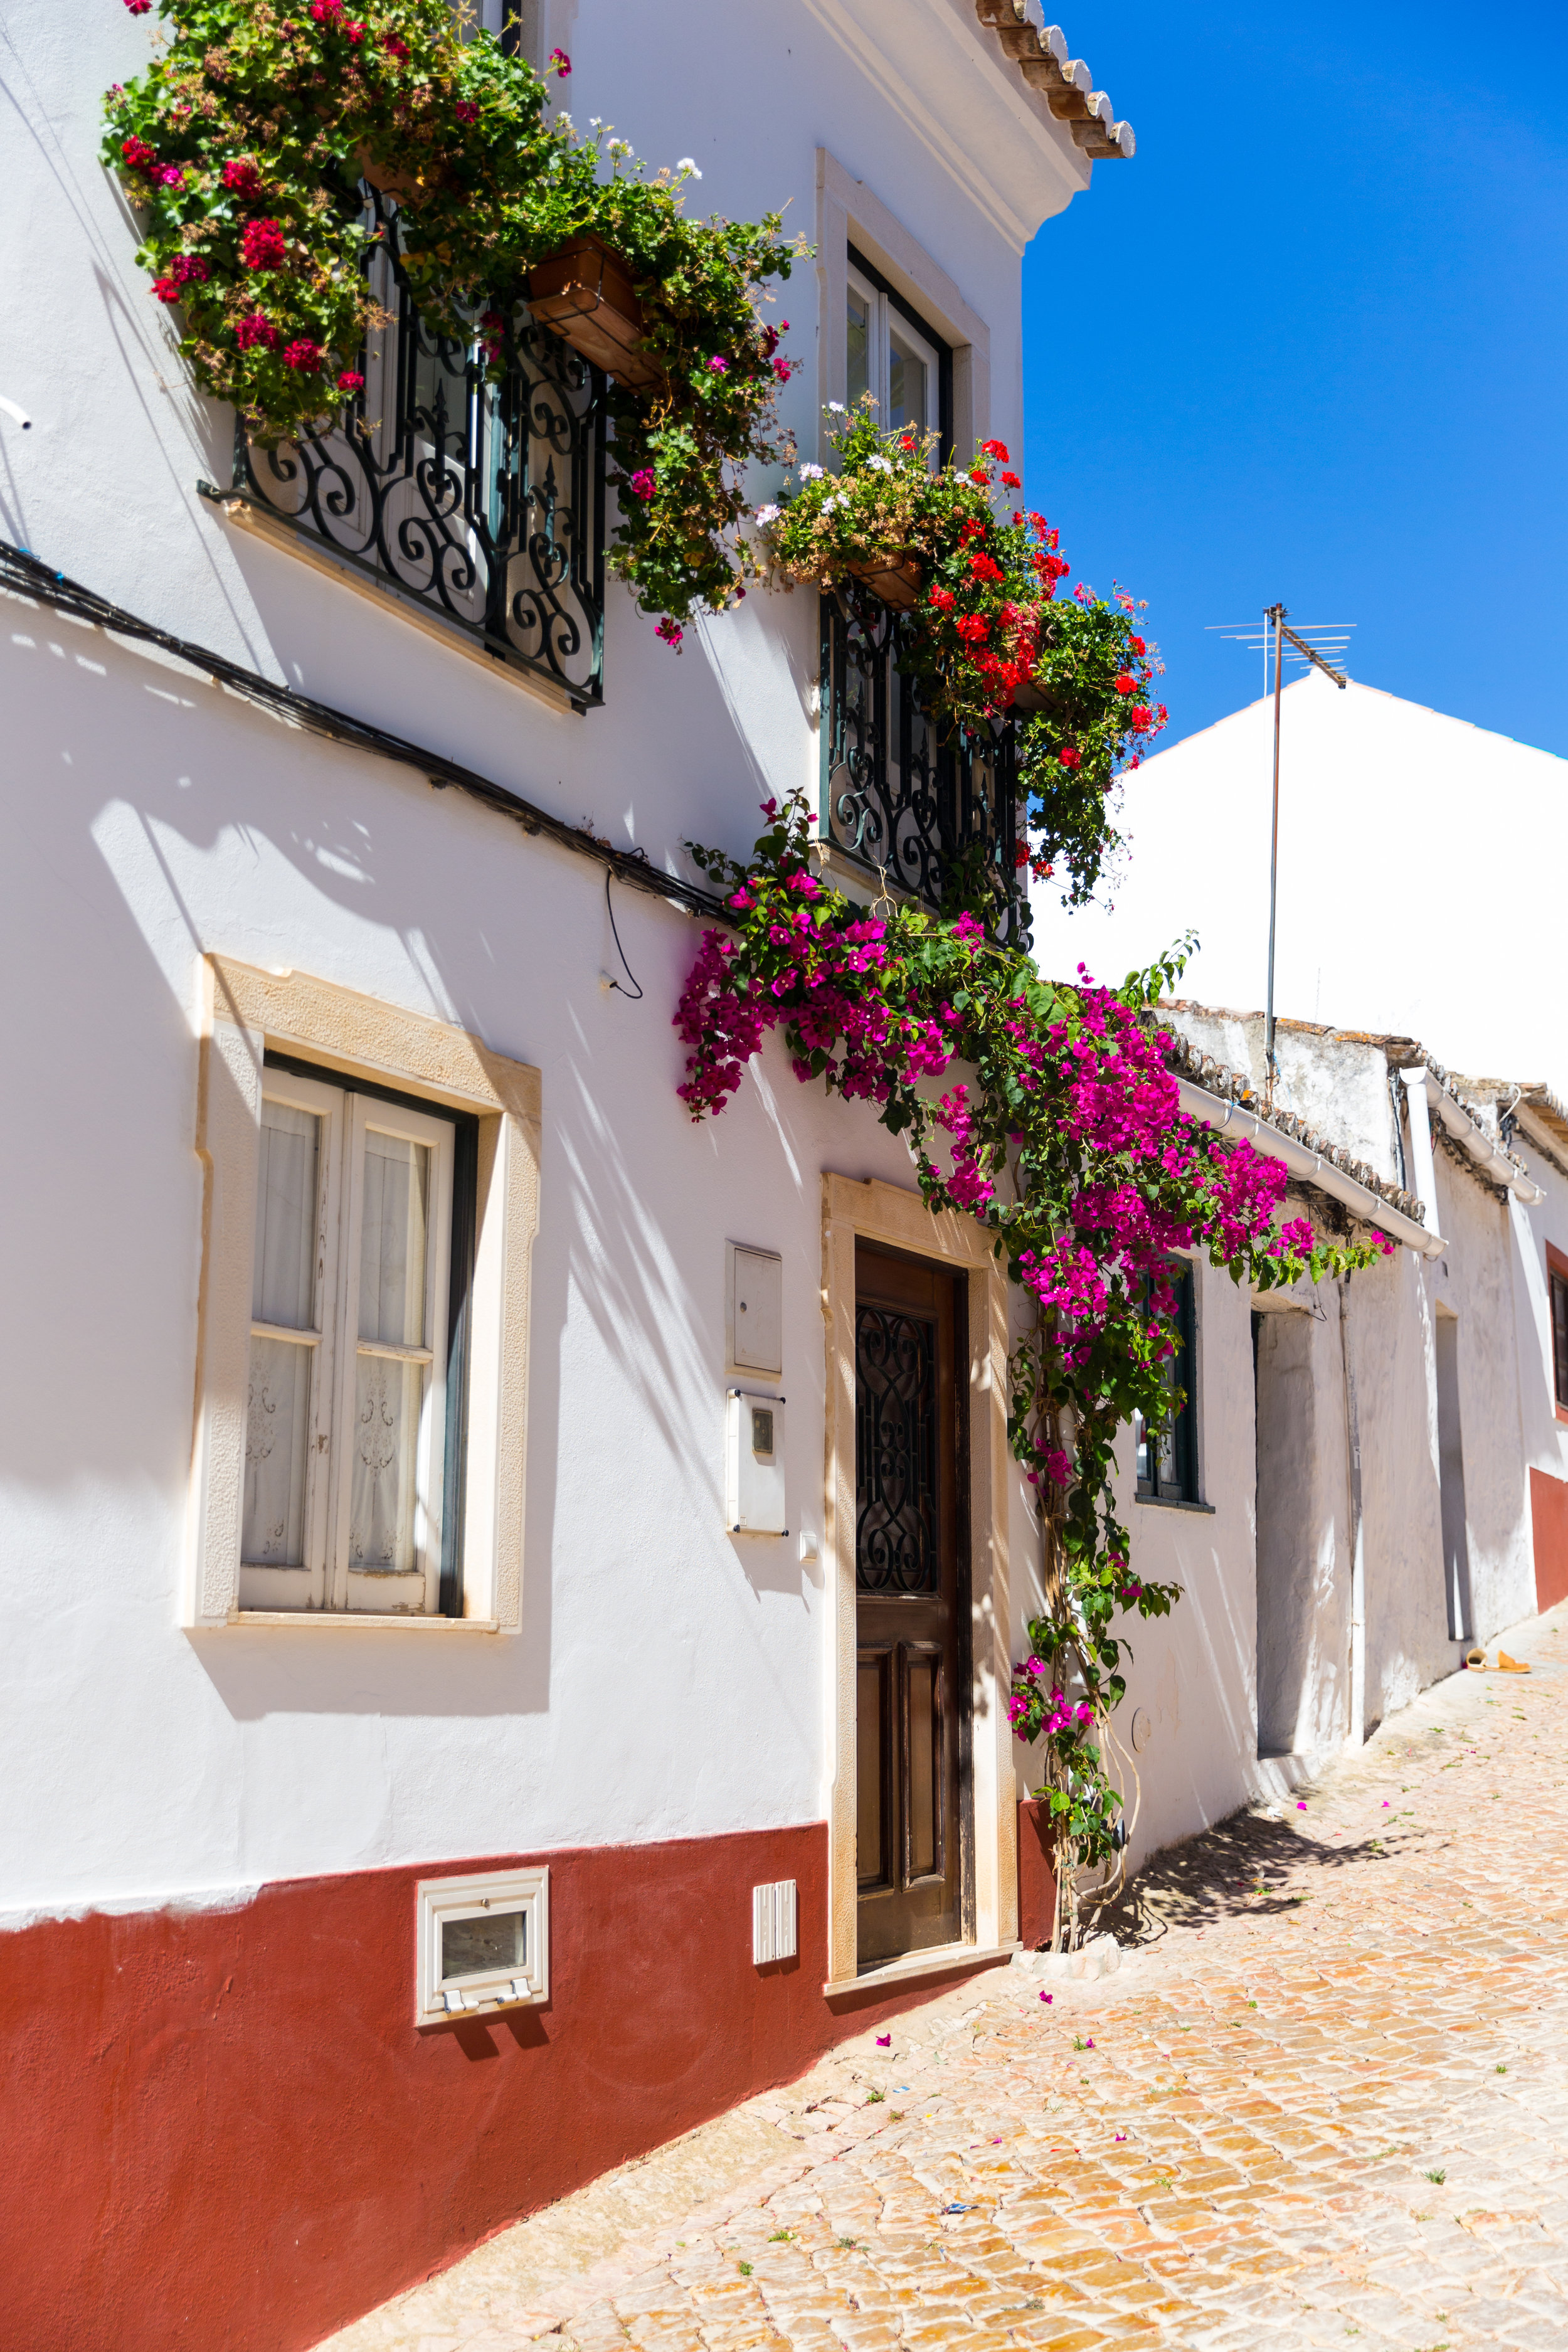 Portugal Algarve Summer Travel-6.jpg